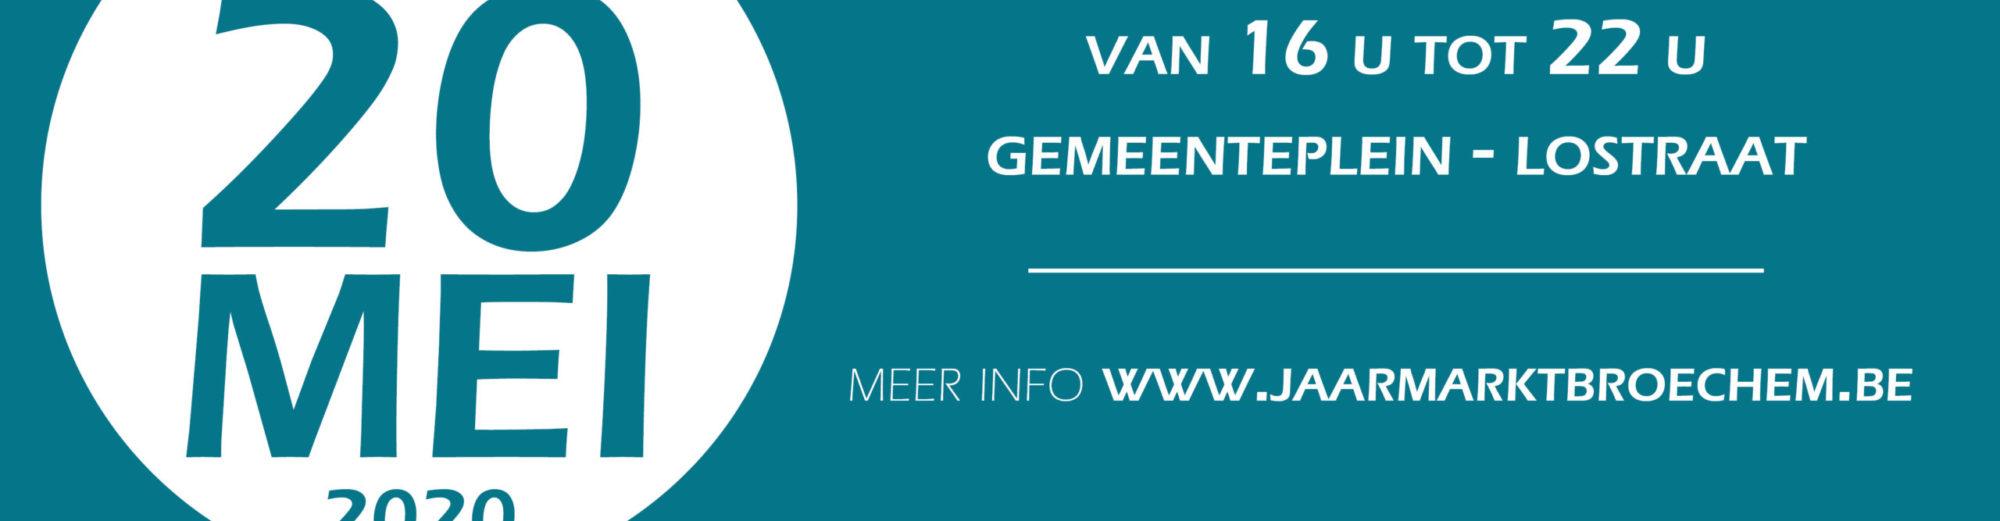 57ste Jaarmarkt Broechem – 11-14 september 2020